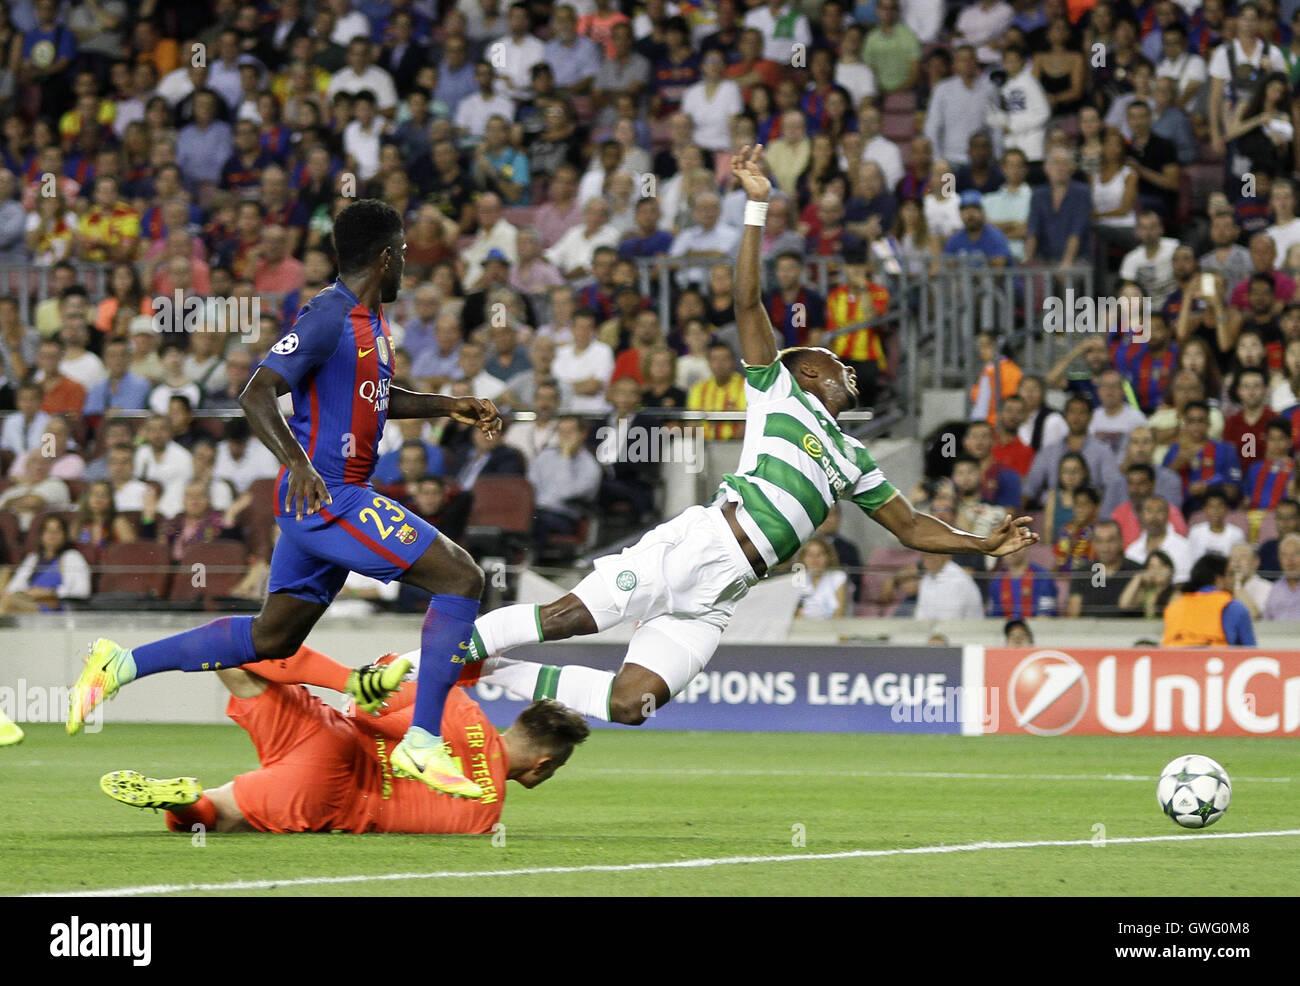 Nou Camp, Barcelona, Spain. 13th Sep, 2016. UEFA Champions League Football. Barcelona versus Celtic. Moussa Dembele - Stock Image